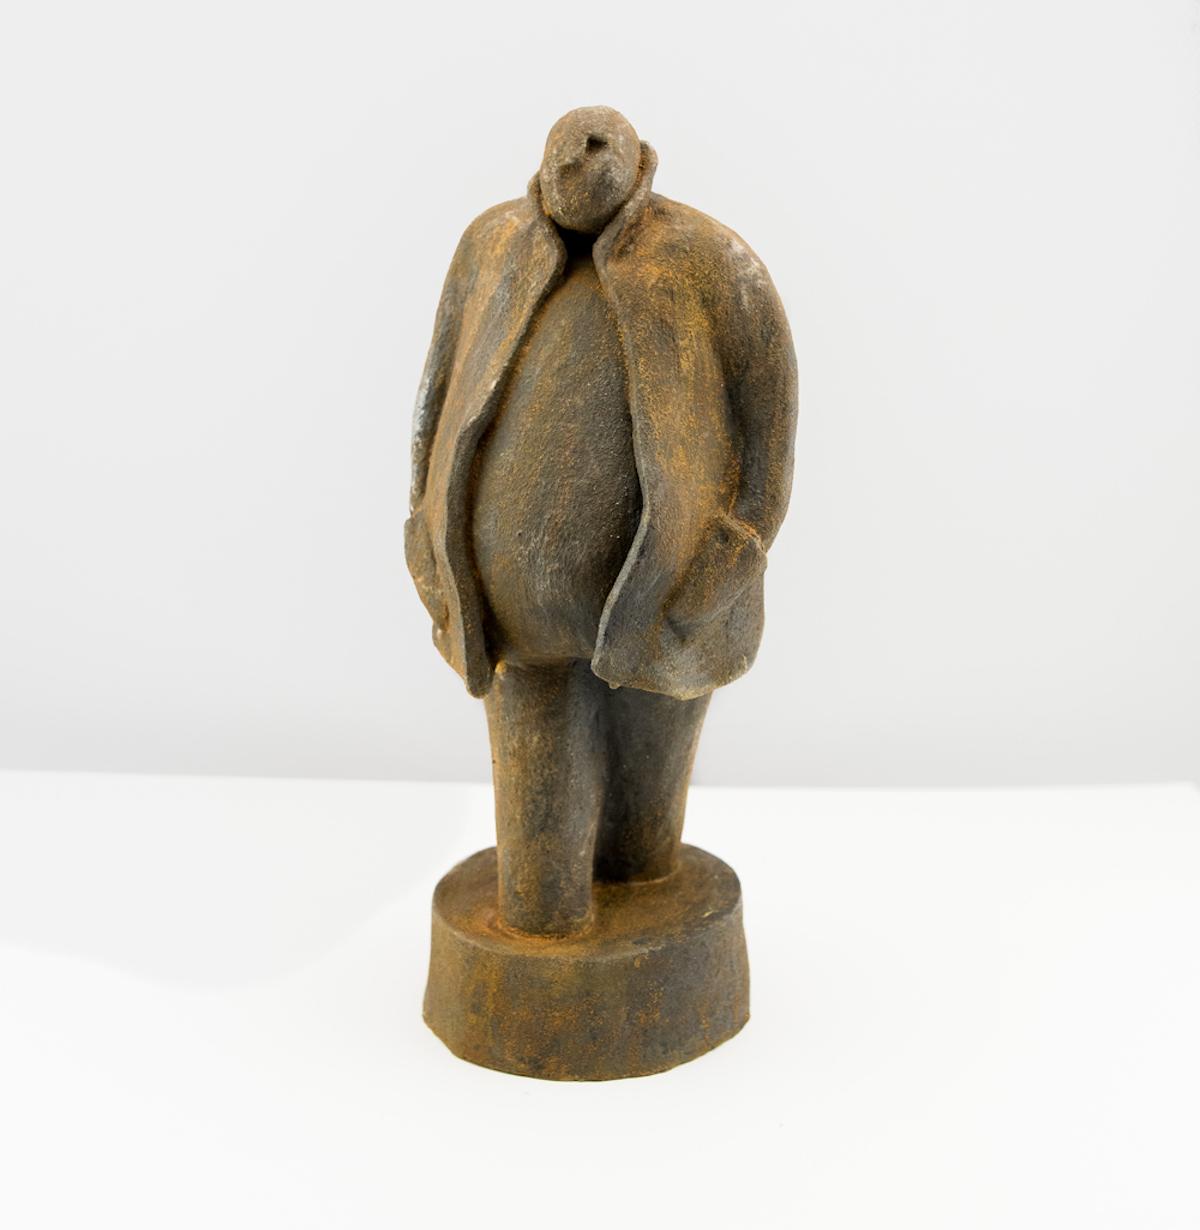 Lars-Lennart Stenberg Skulptur   Patinerat stengods  H30 x B15 x D13 cm 4 000 kr